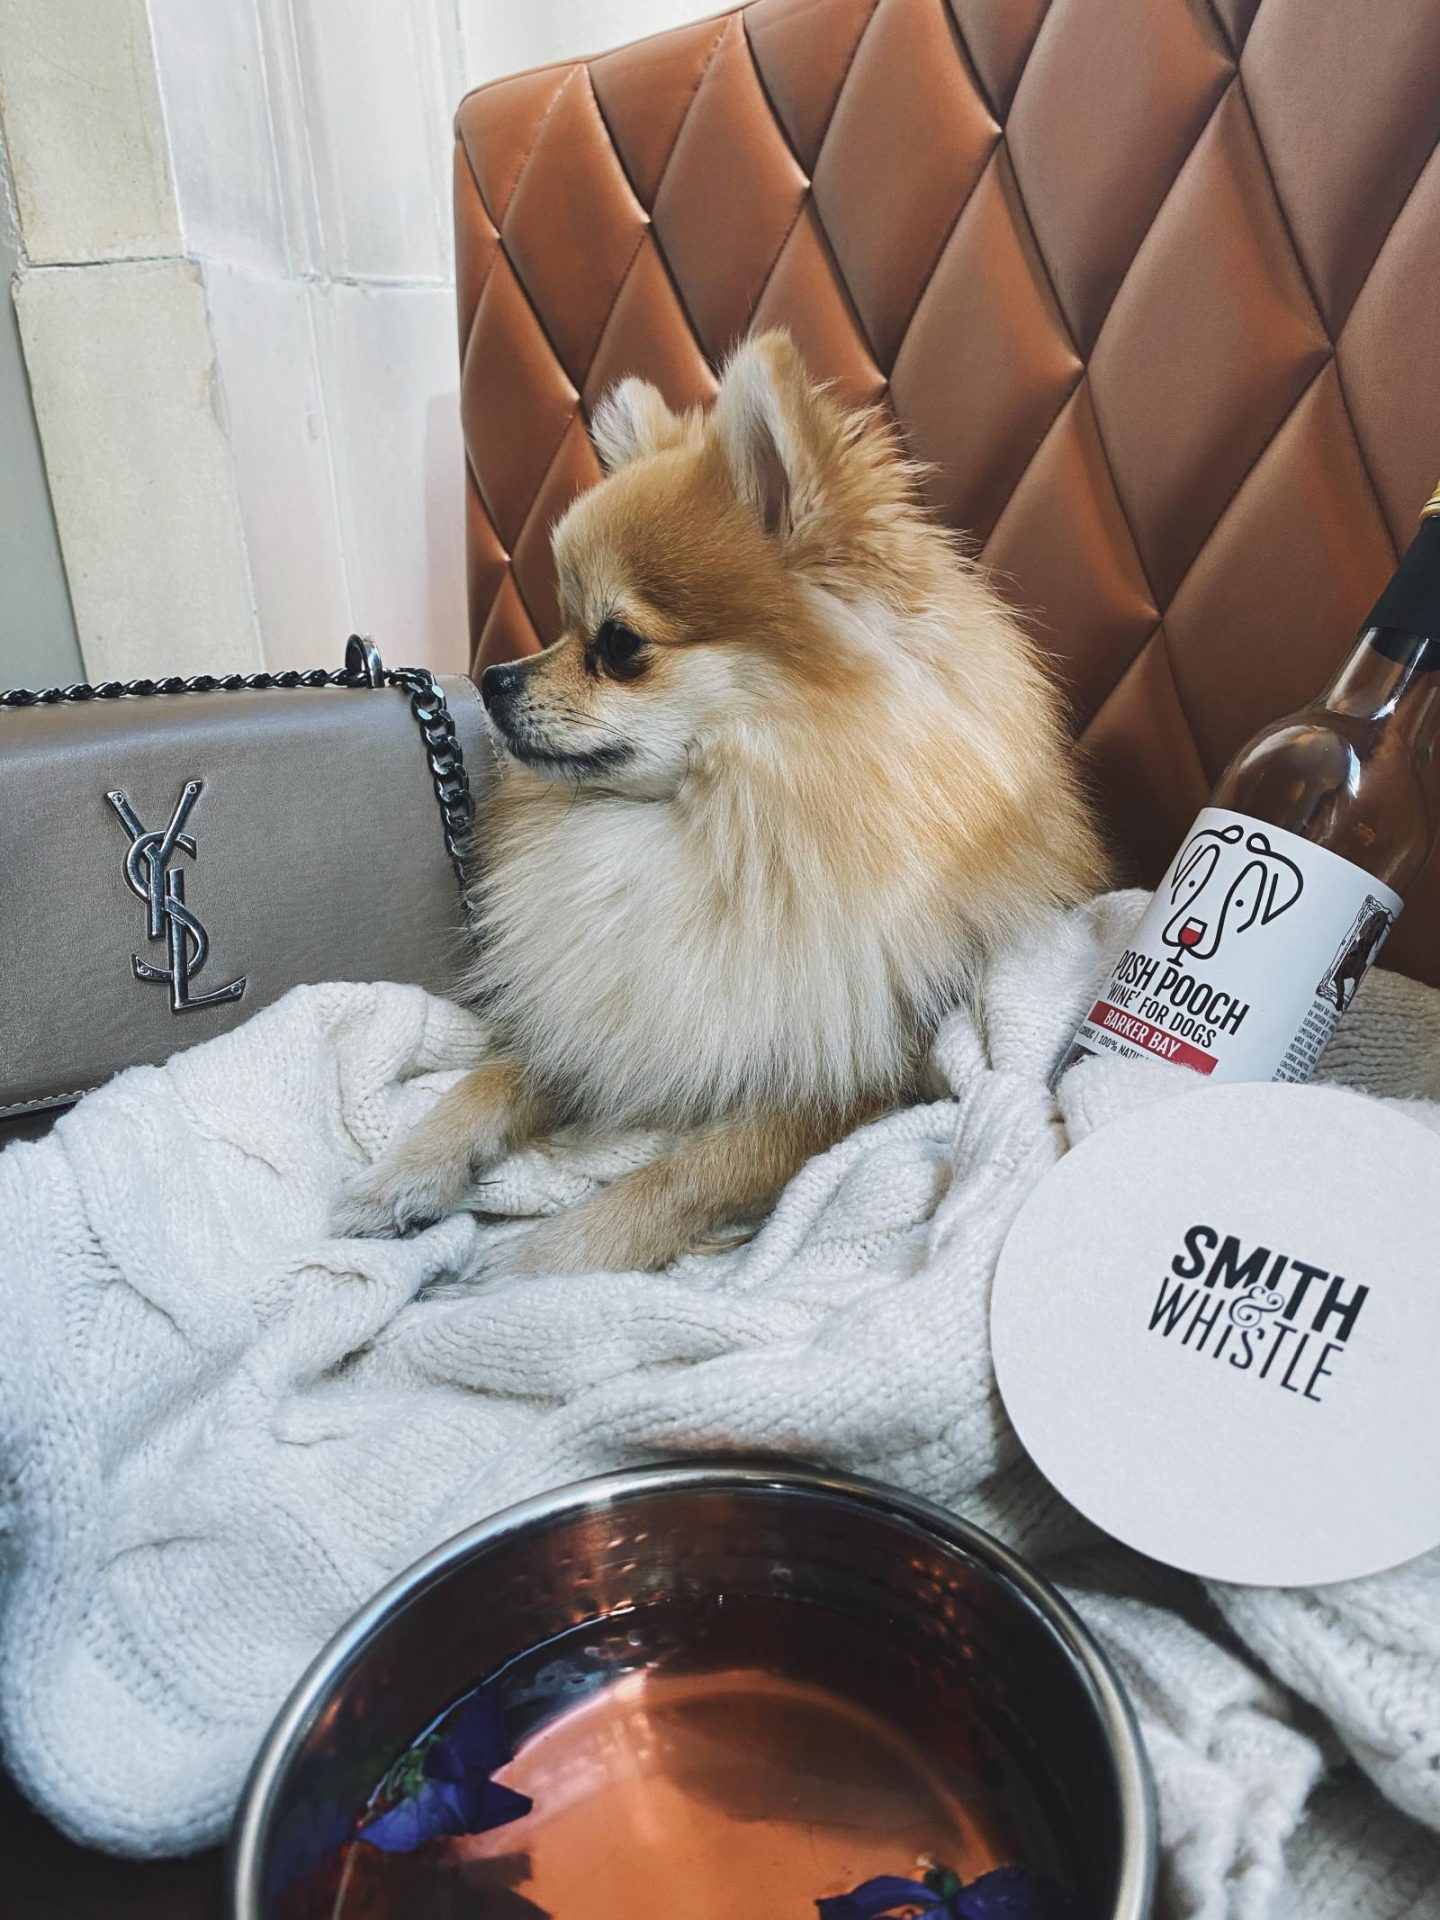 Smith & Whistle dog friendly bar